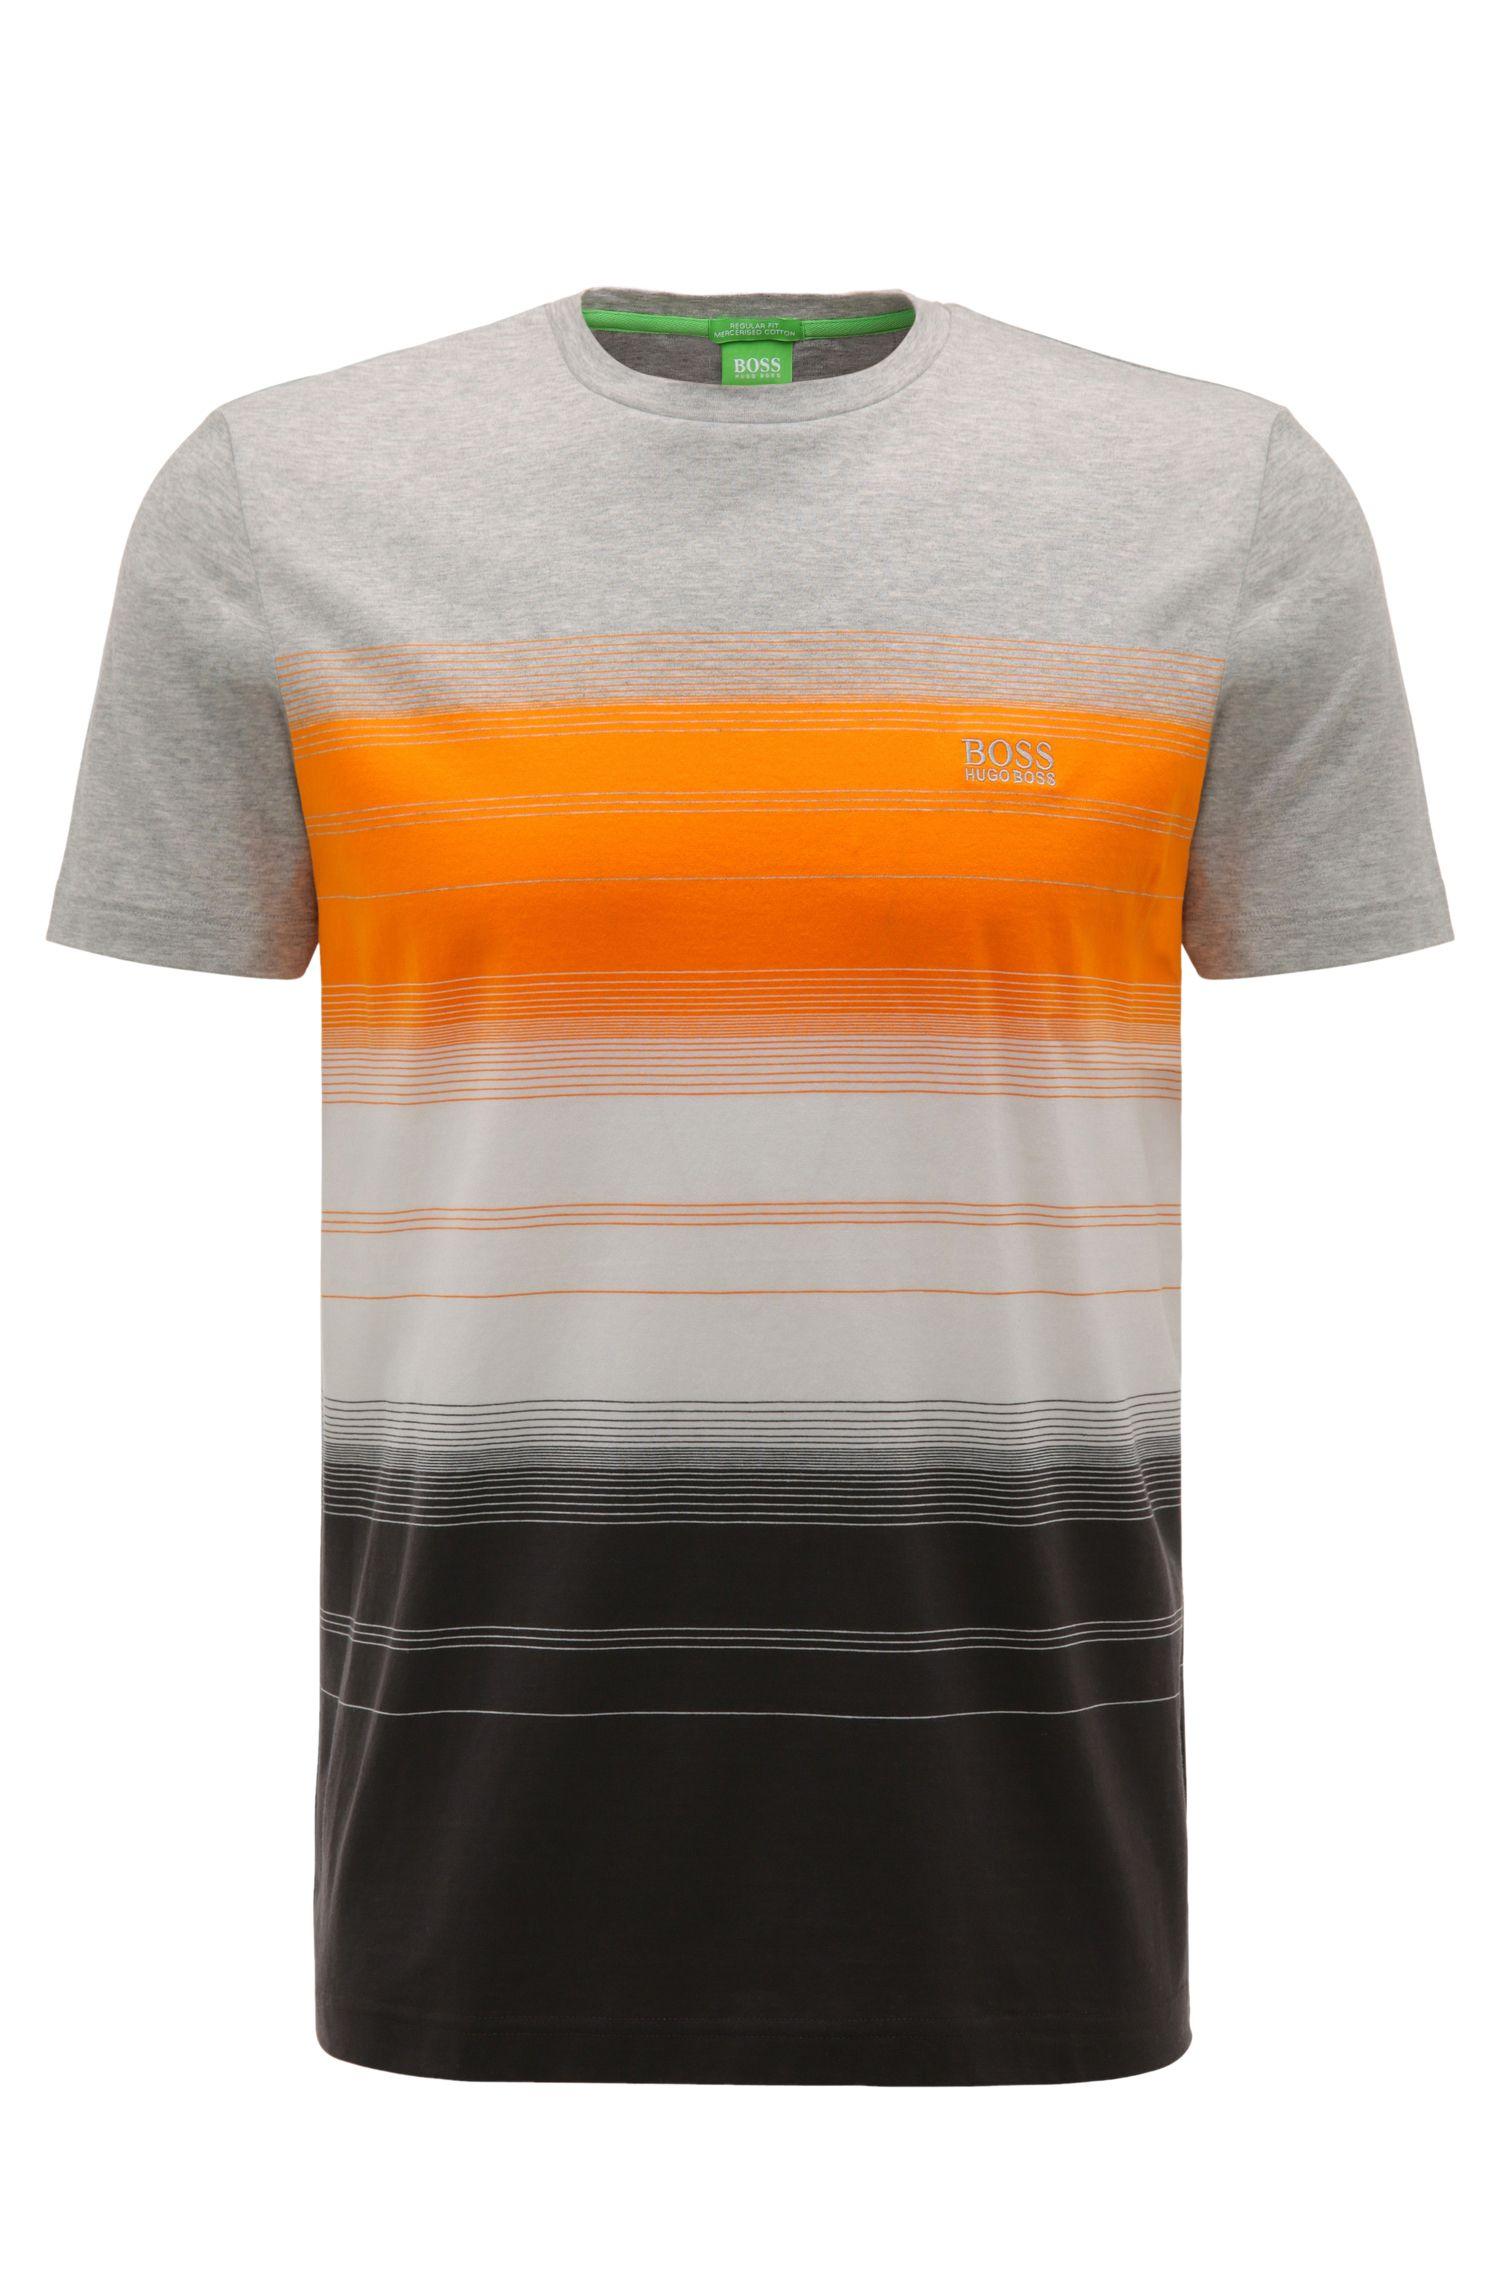 T-shirt Regular Fit en coton à motif rayé: «Tee12»